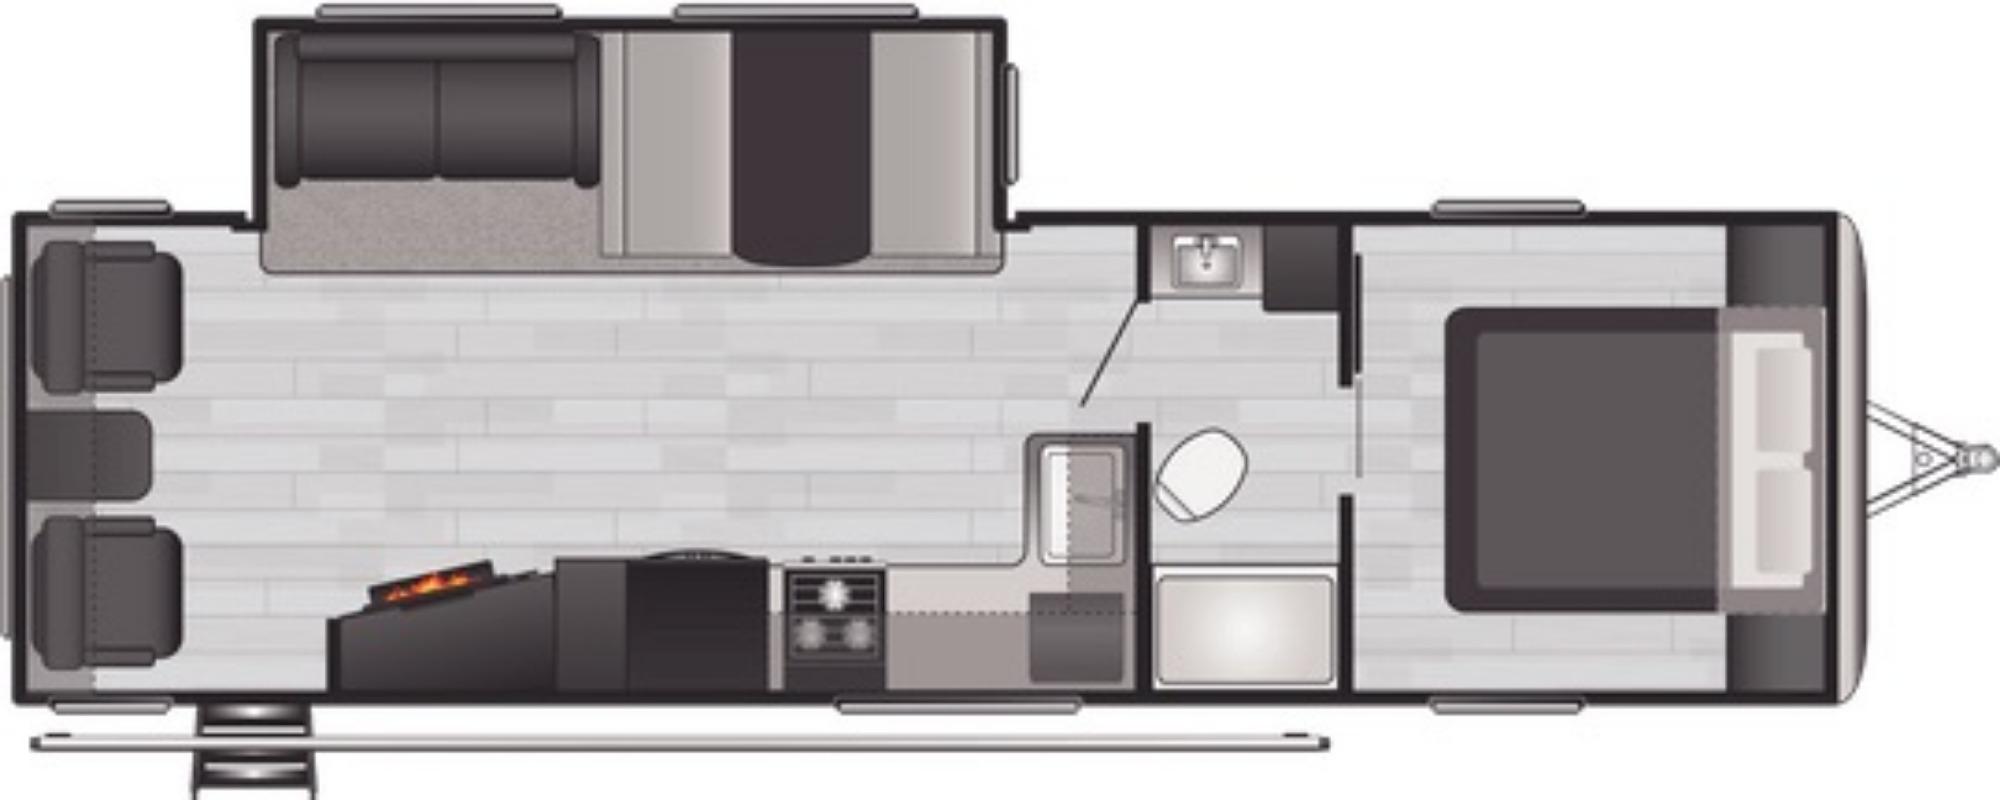 View Floor Plan for 2021 KEYSTONE SPRINGDALE 285TL